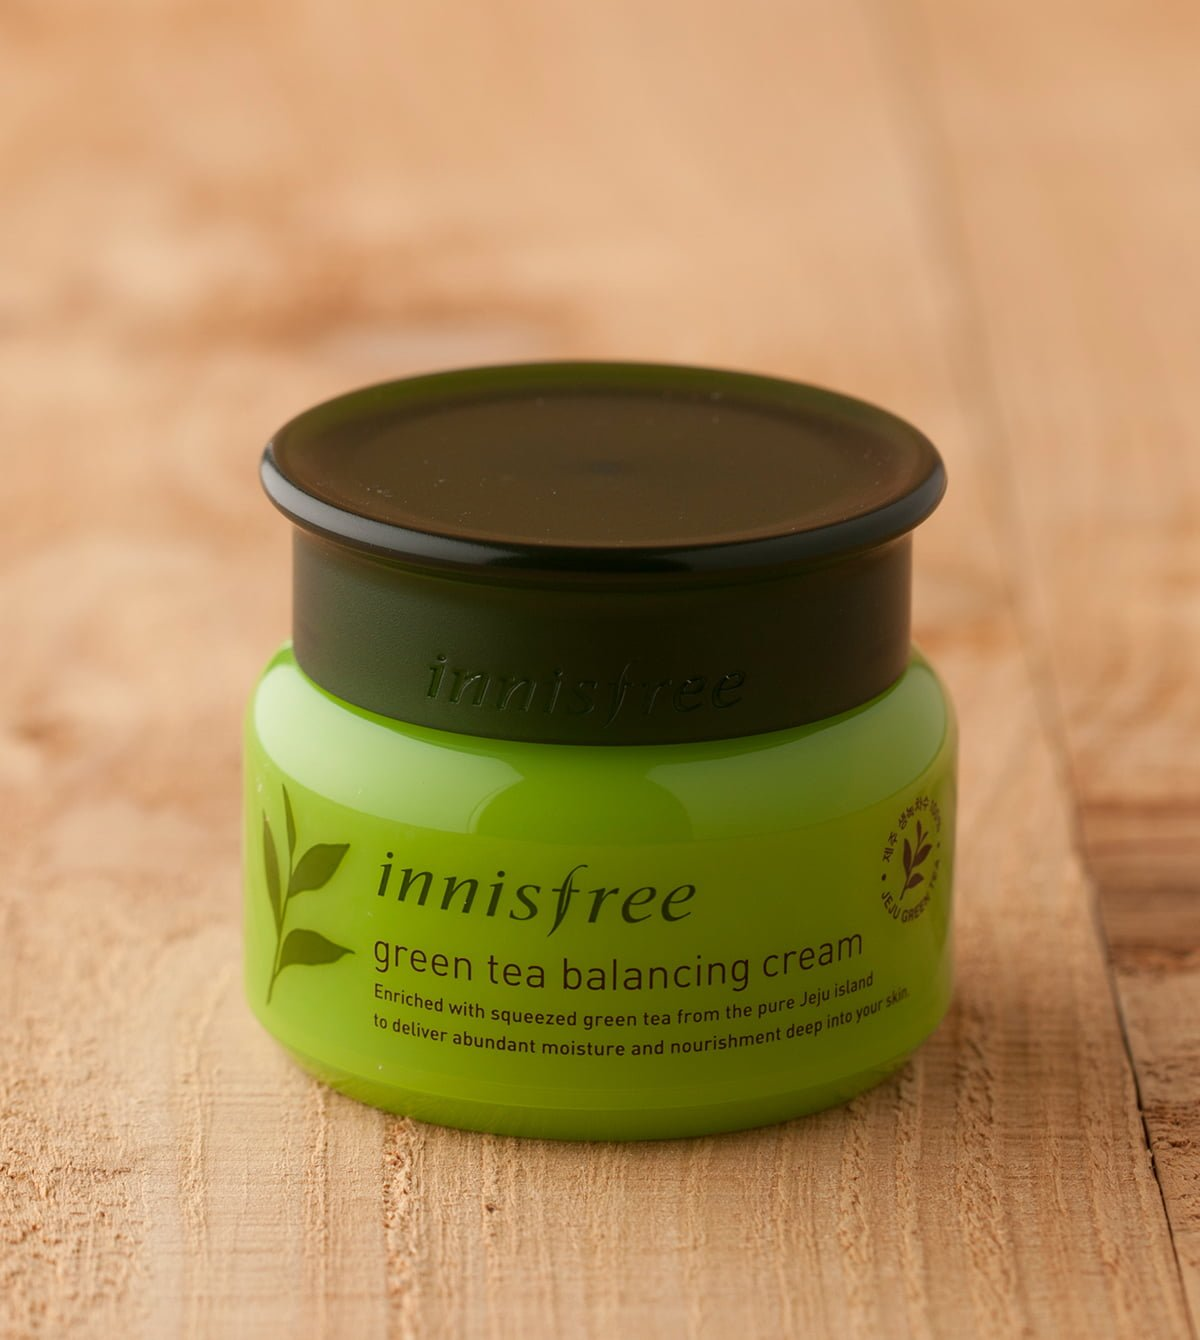 Innisfree Green Tea Balancing Cream review